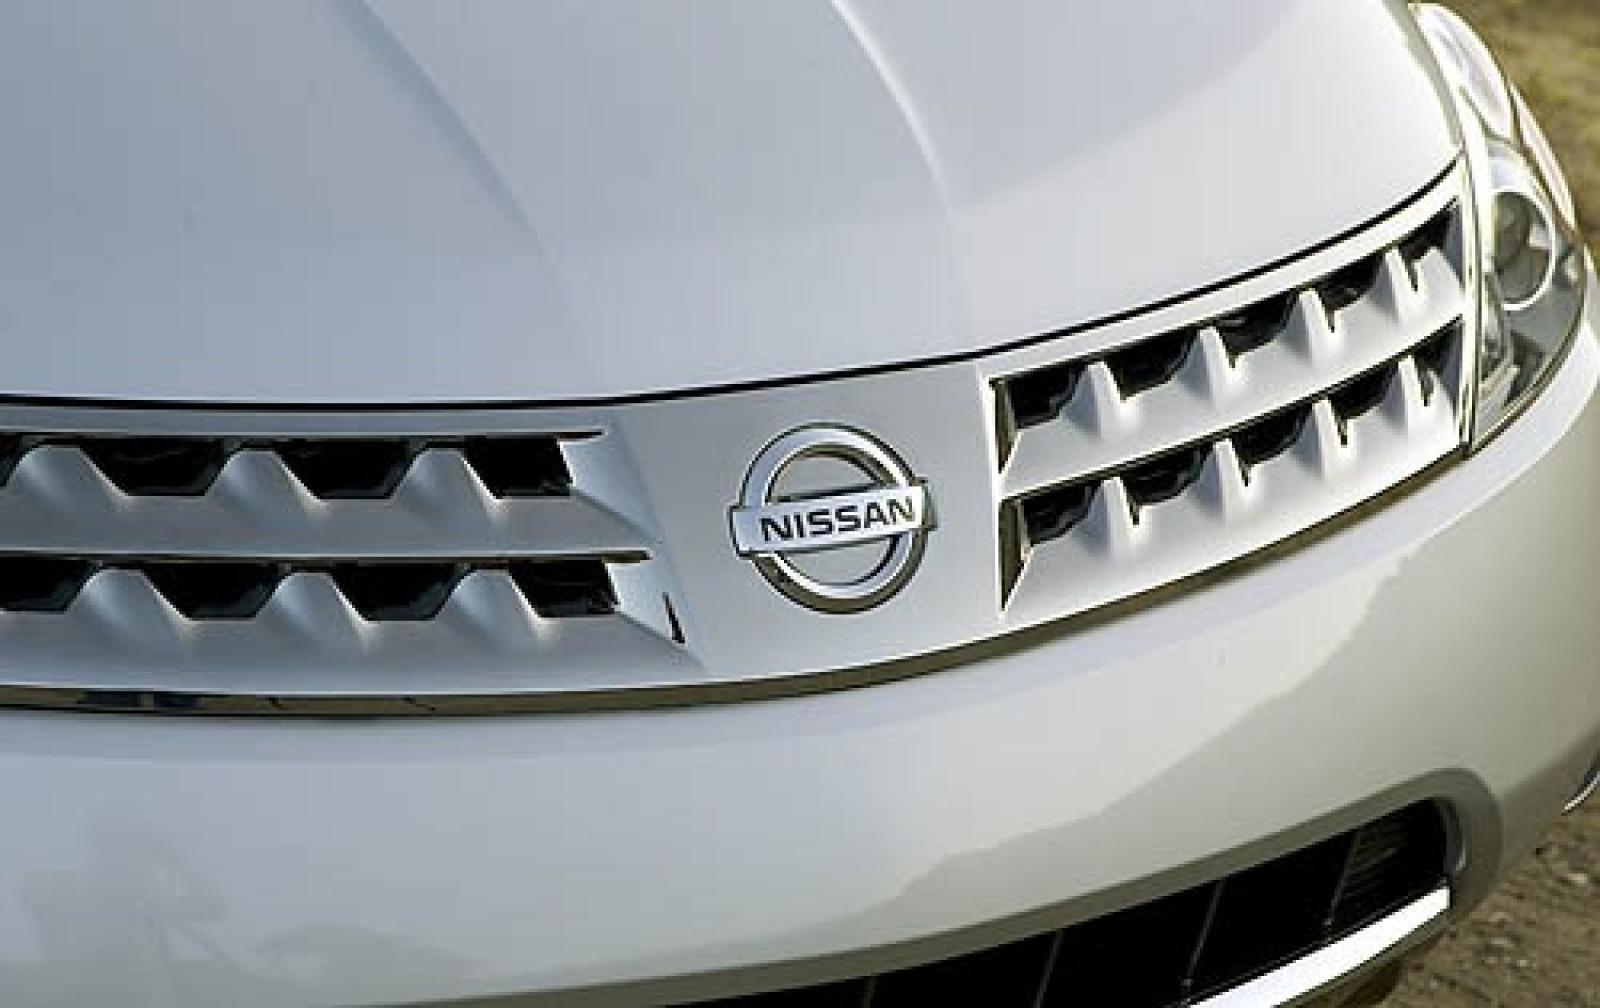 ... 2006 Nissan Murano SL Cen Interior #8 800 1024 1280 1600 Origin ...